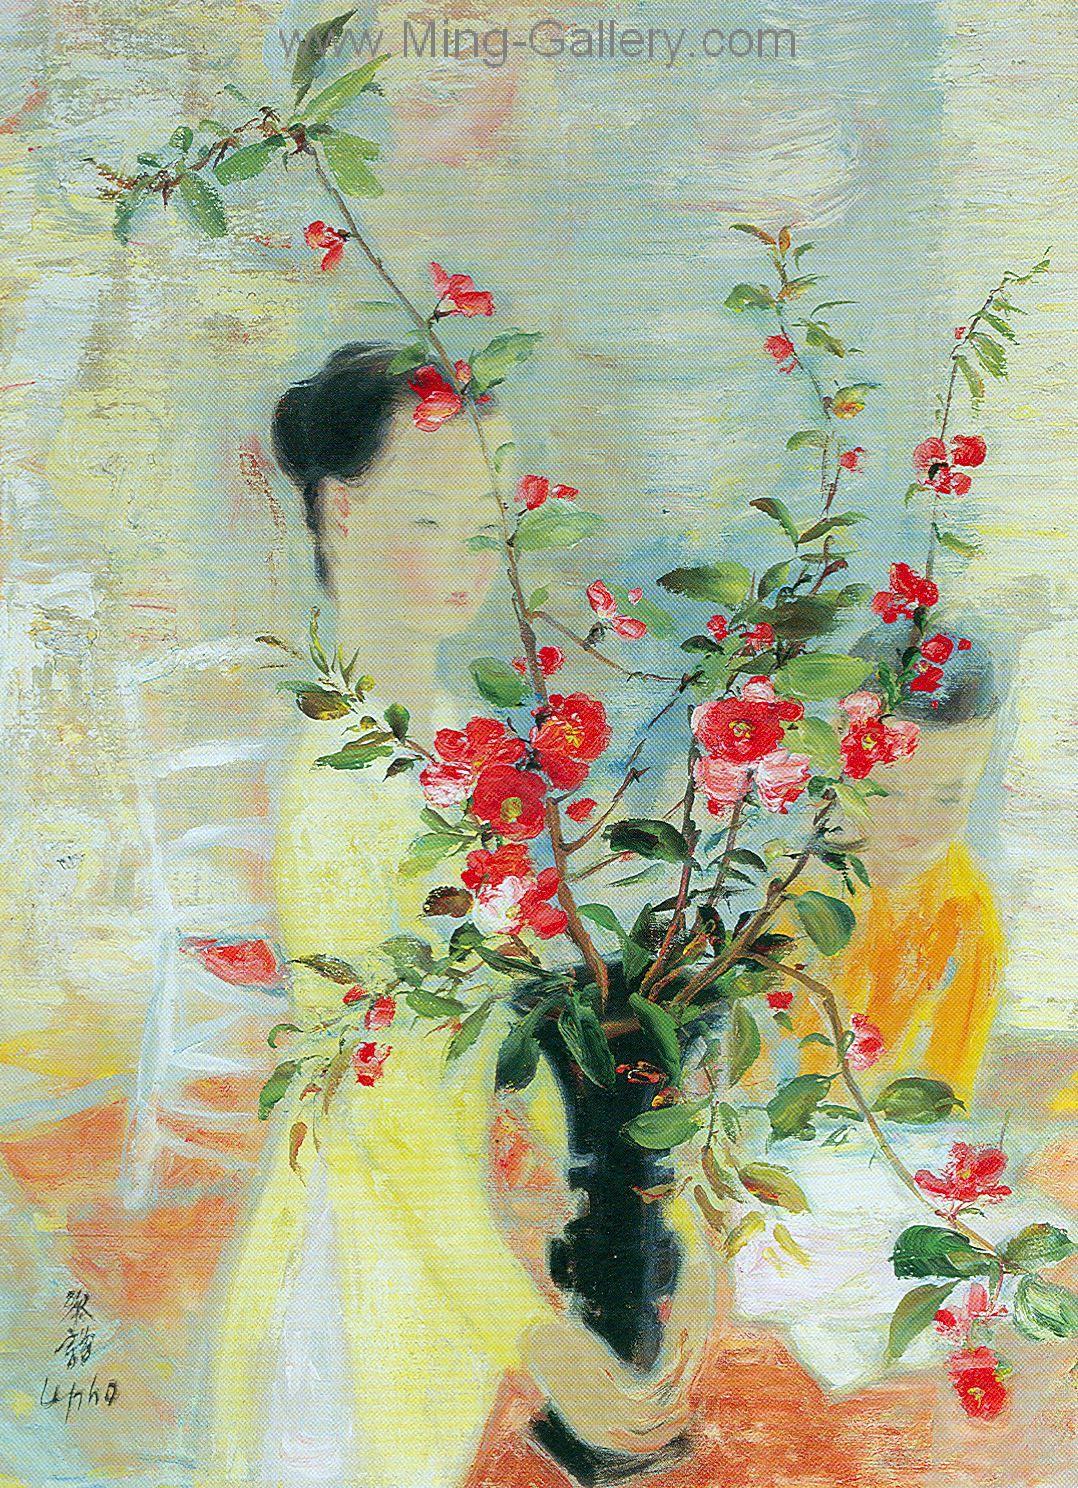 Vnl0008 Le Pho Vietnamese Art